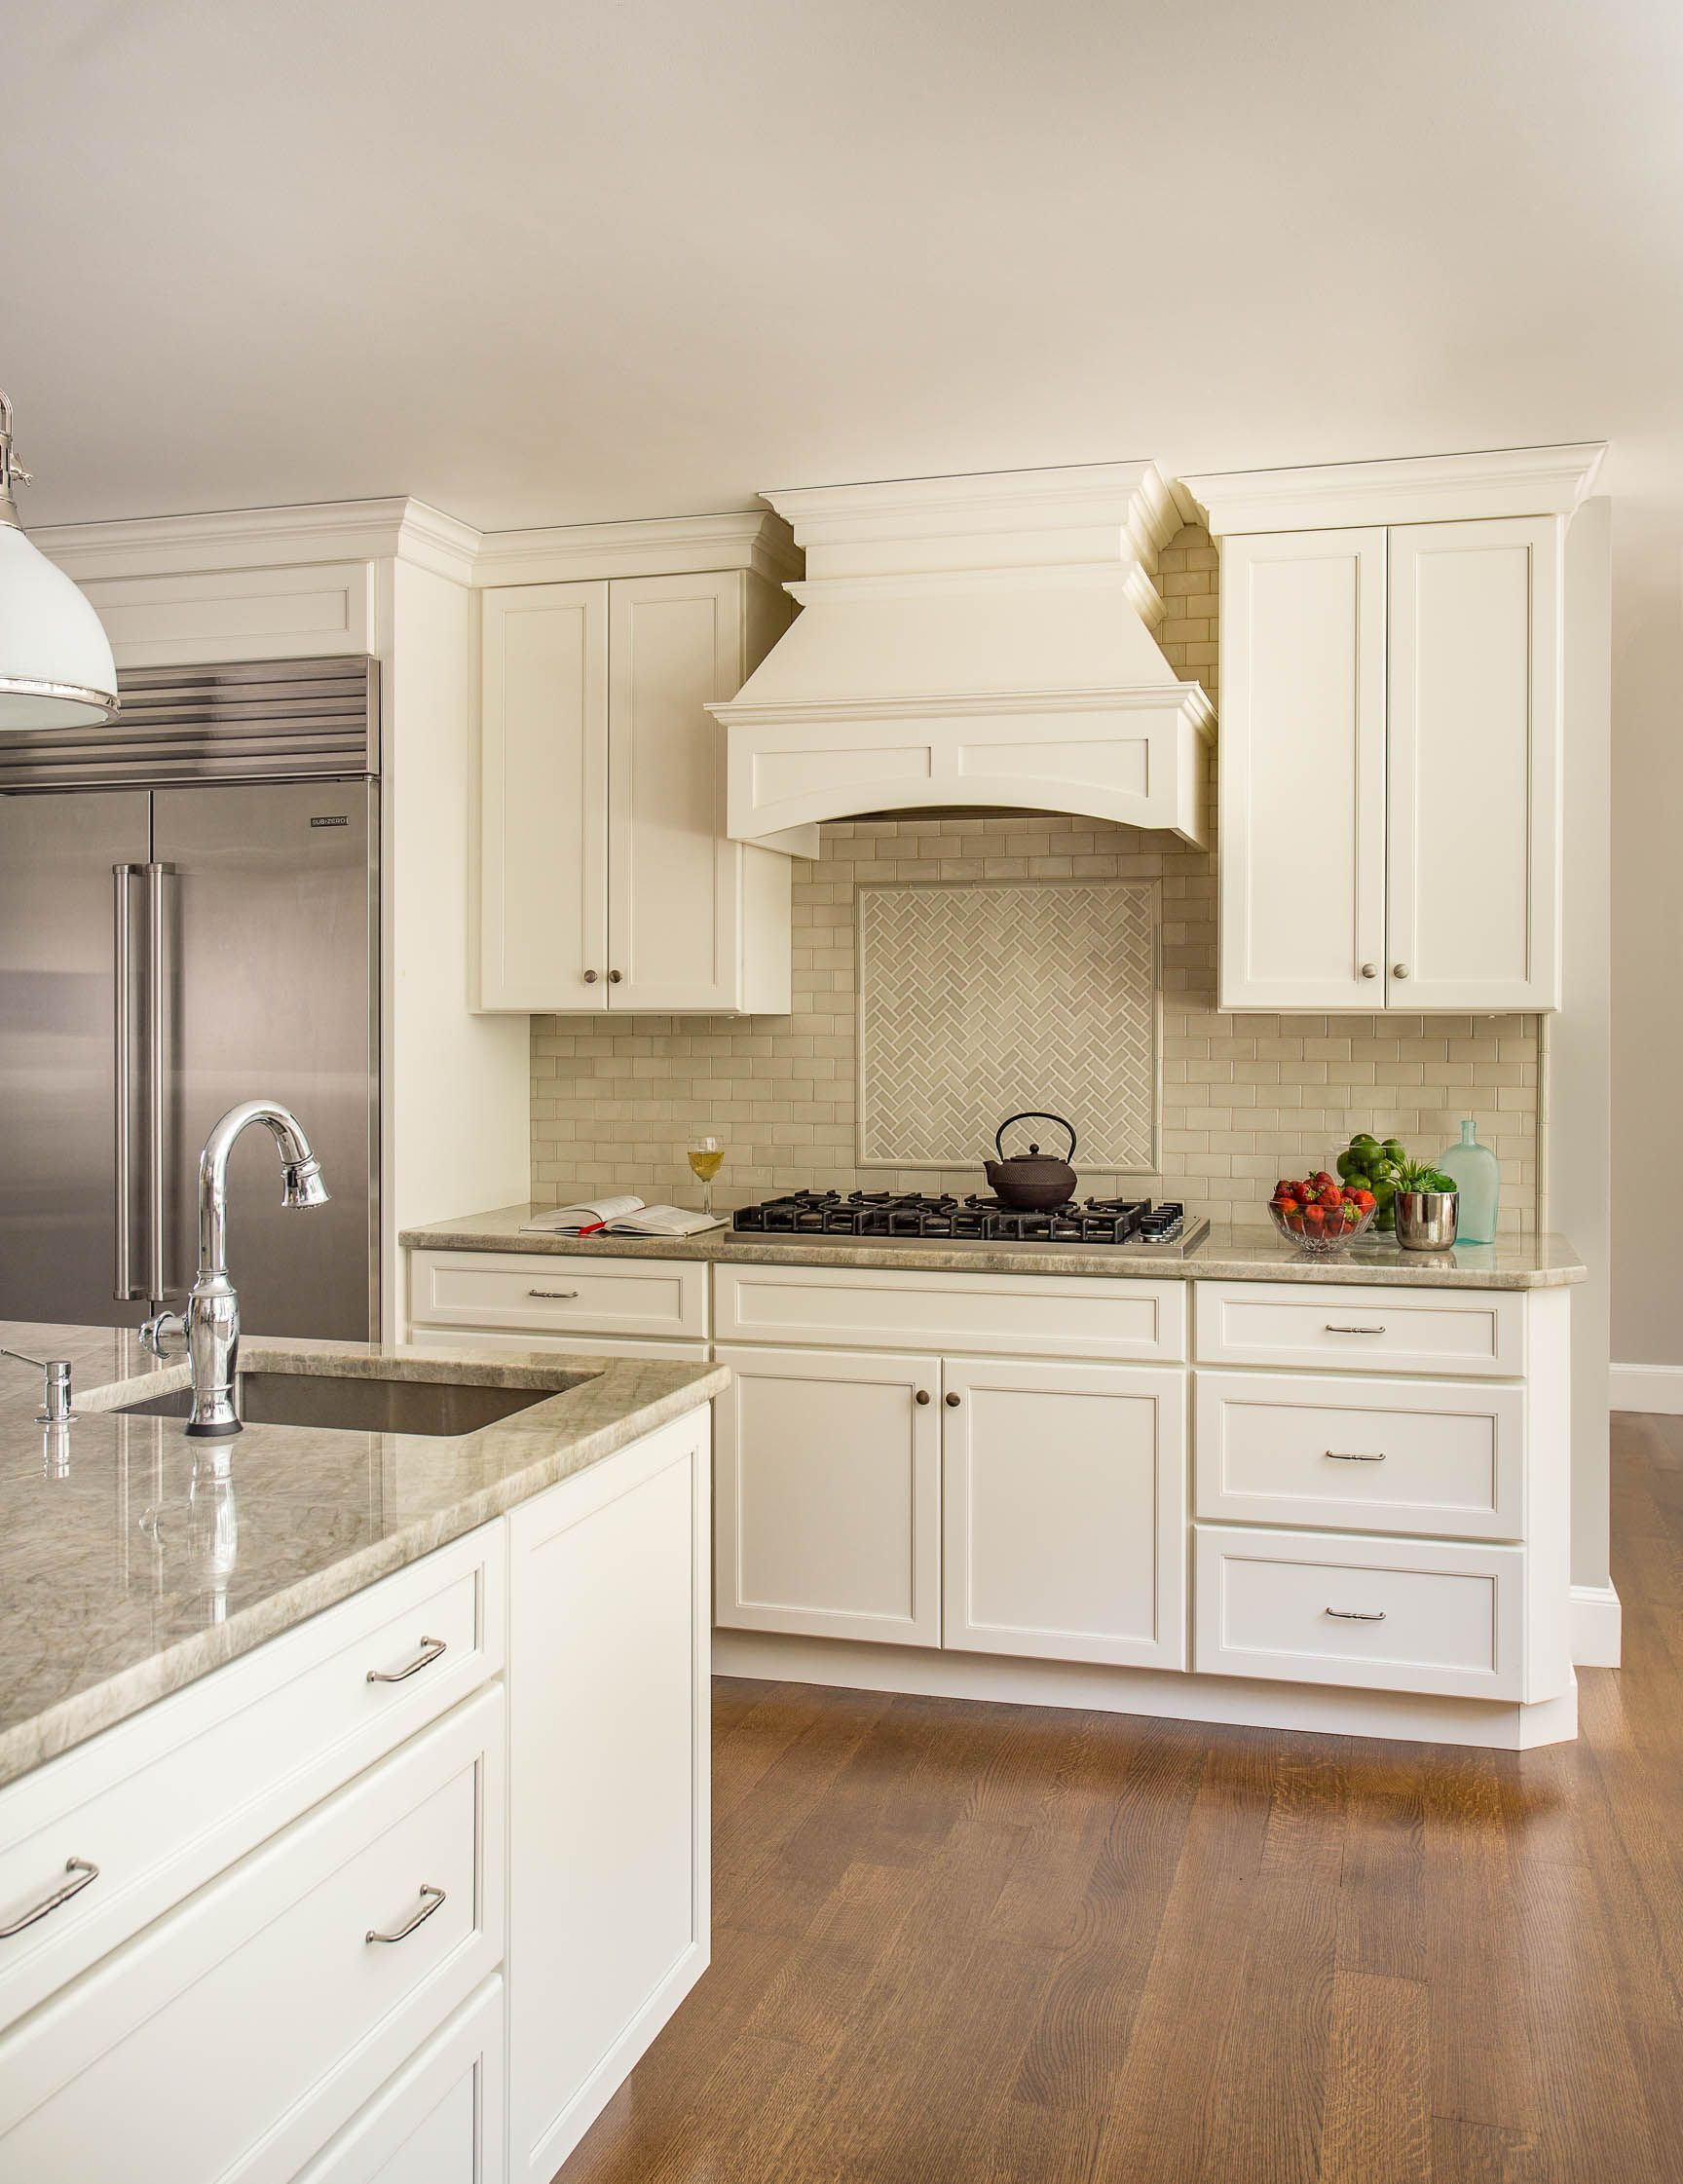 Transitional Style Transitional Kitchen Quartzite Countertops Kitchen